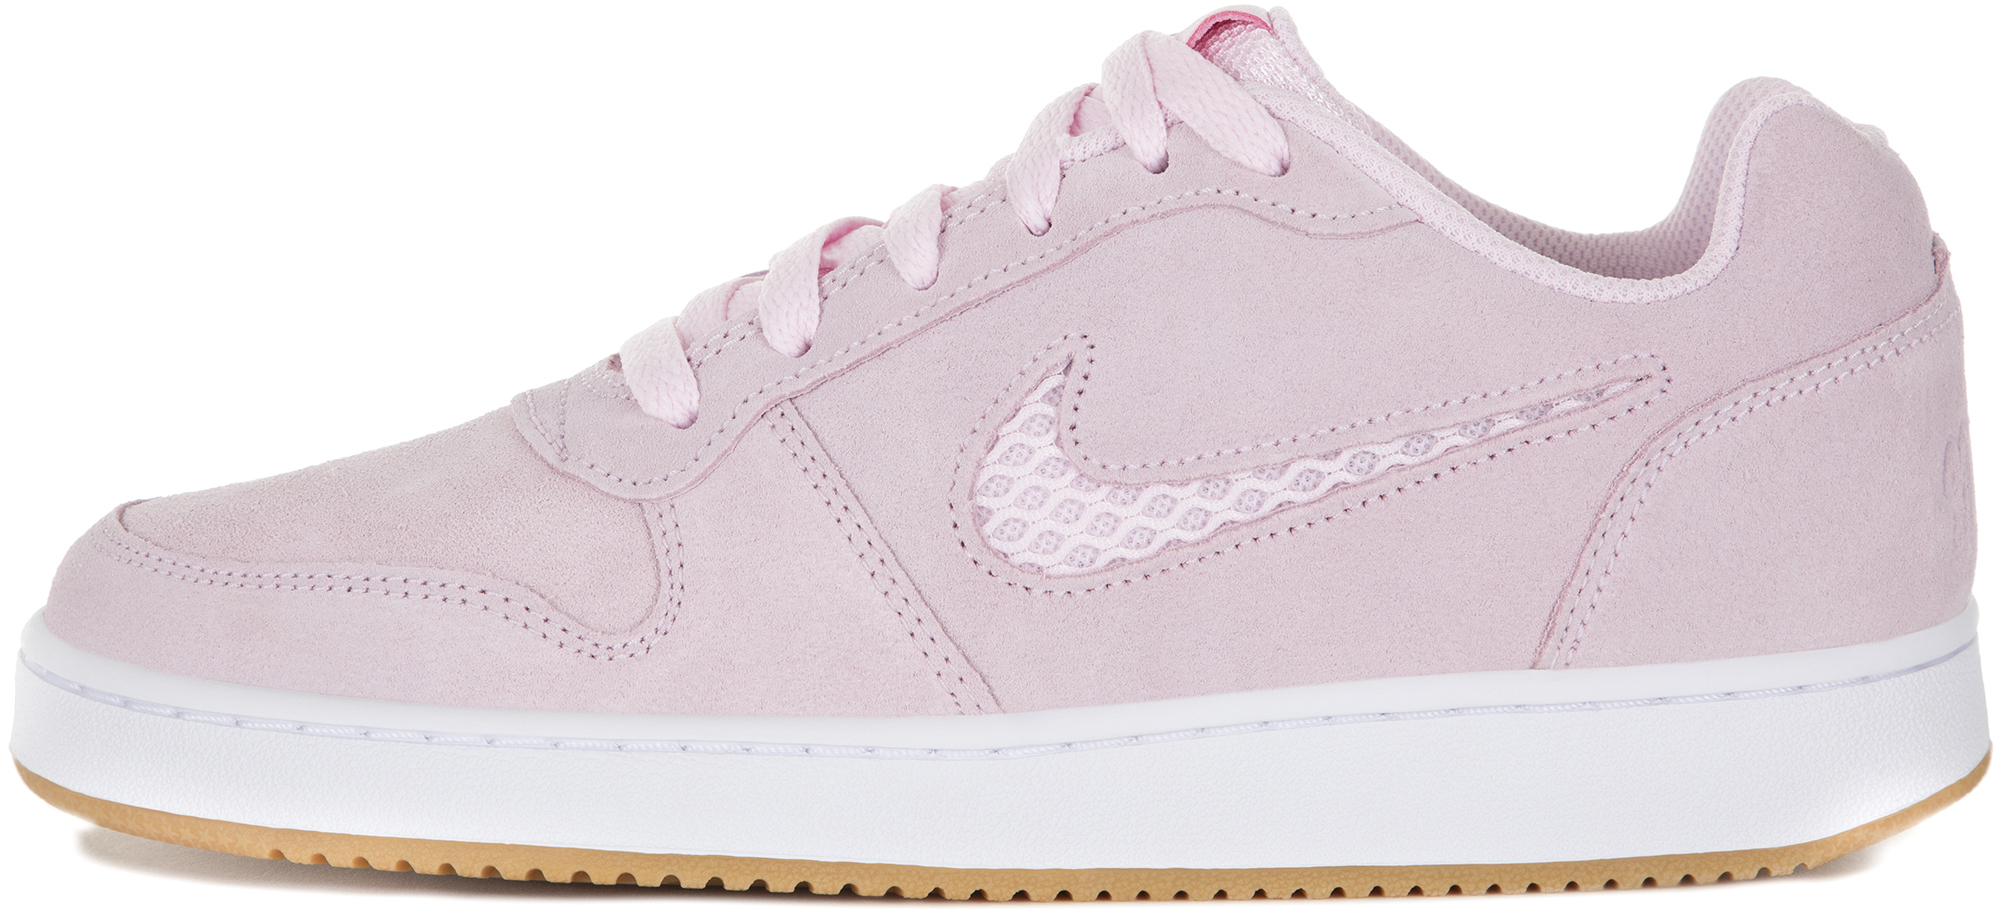 Nike Кеды женские Nike Ebernon Low Premium, размер 39